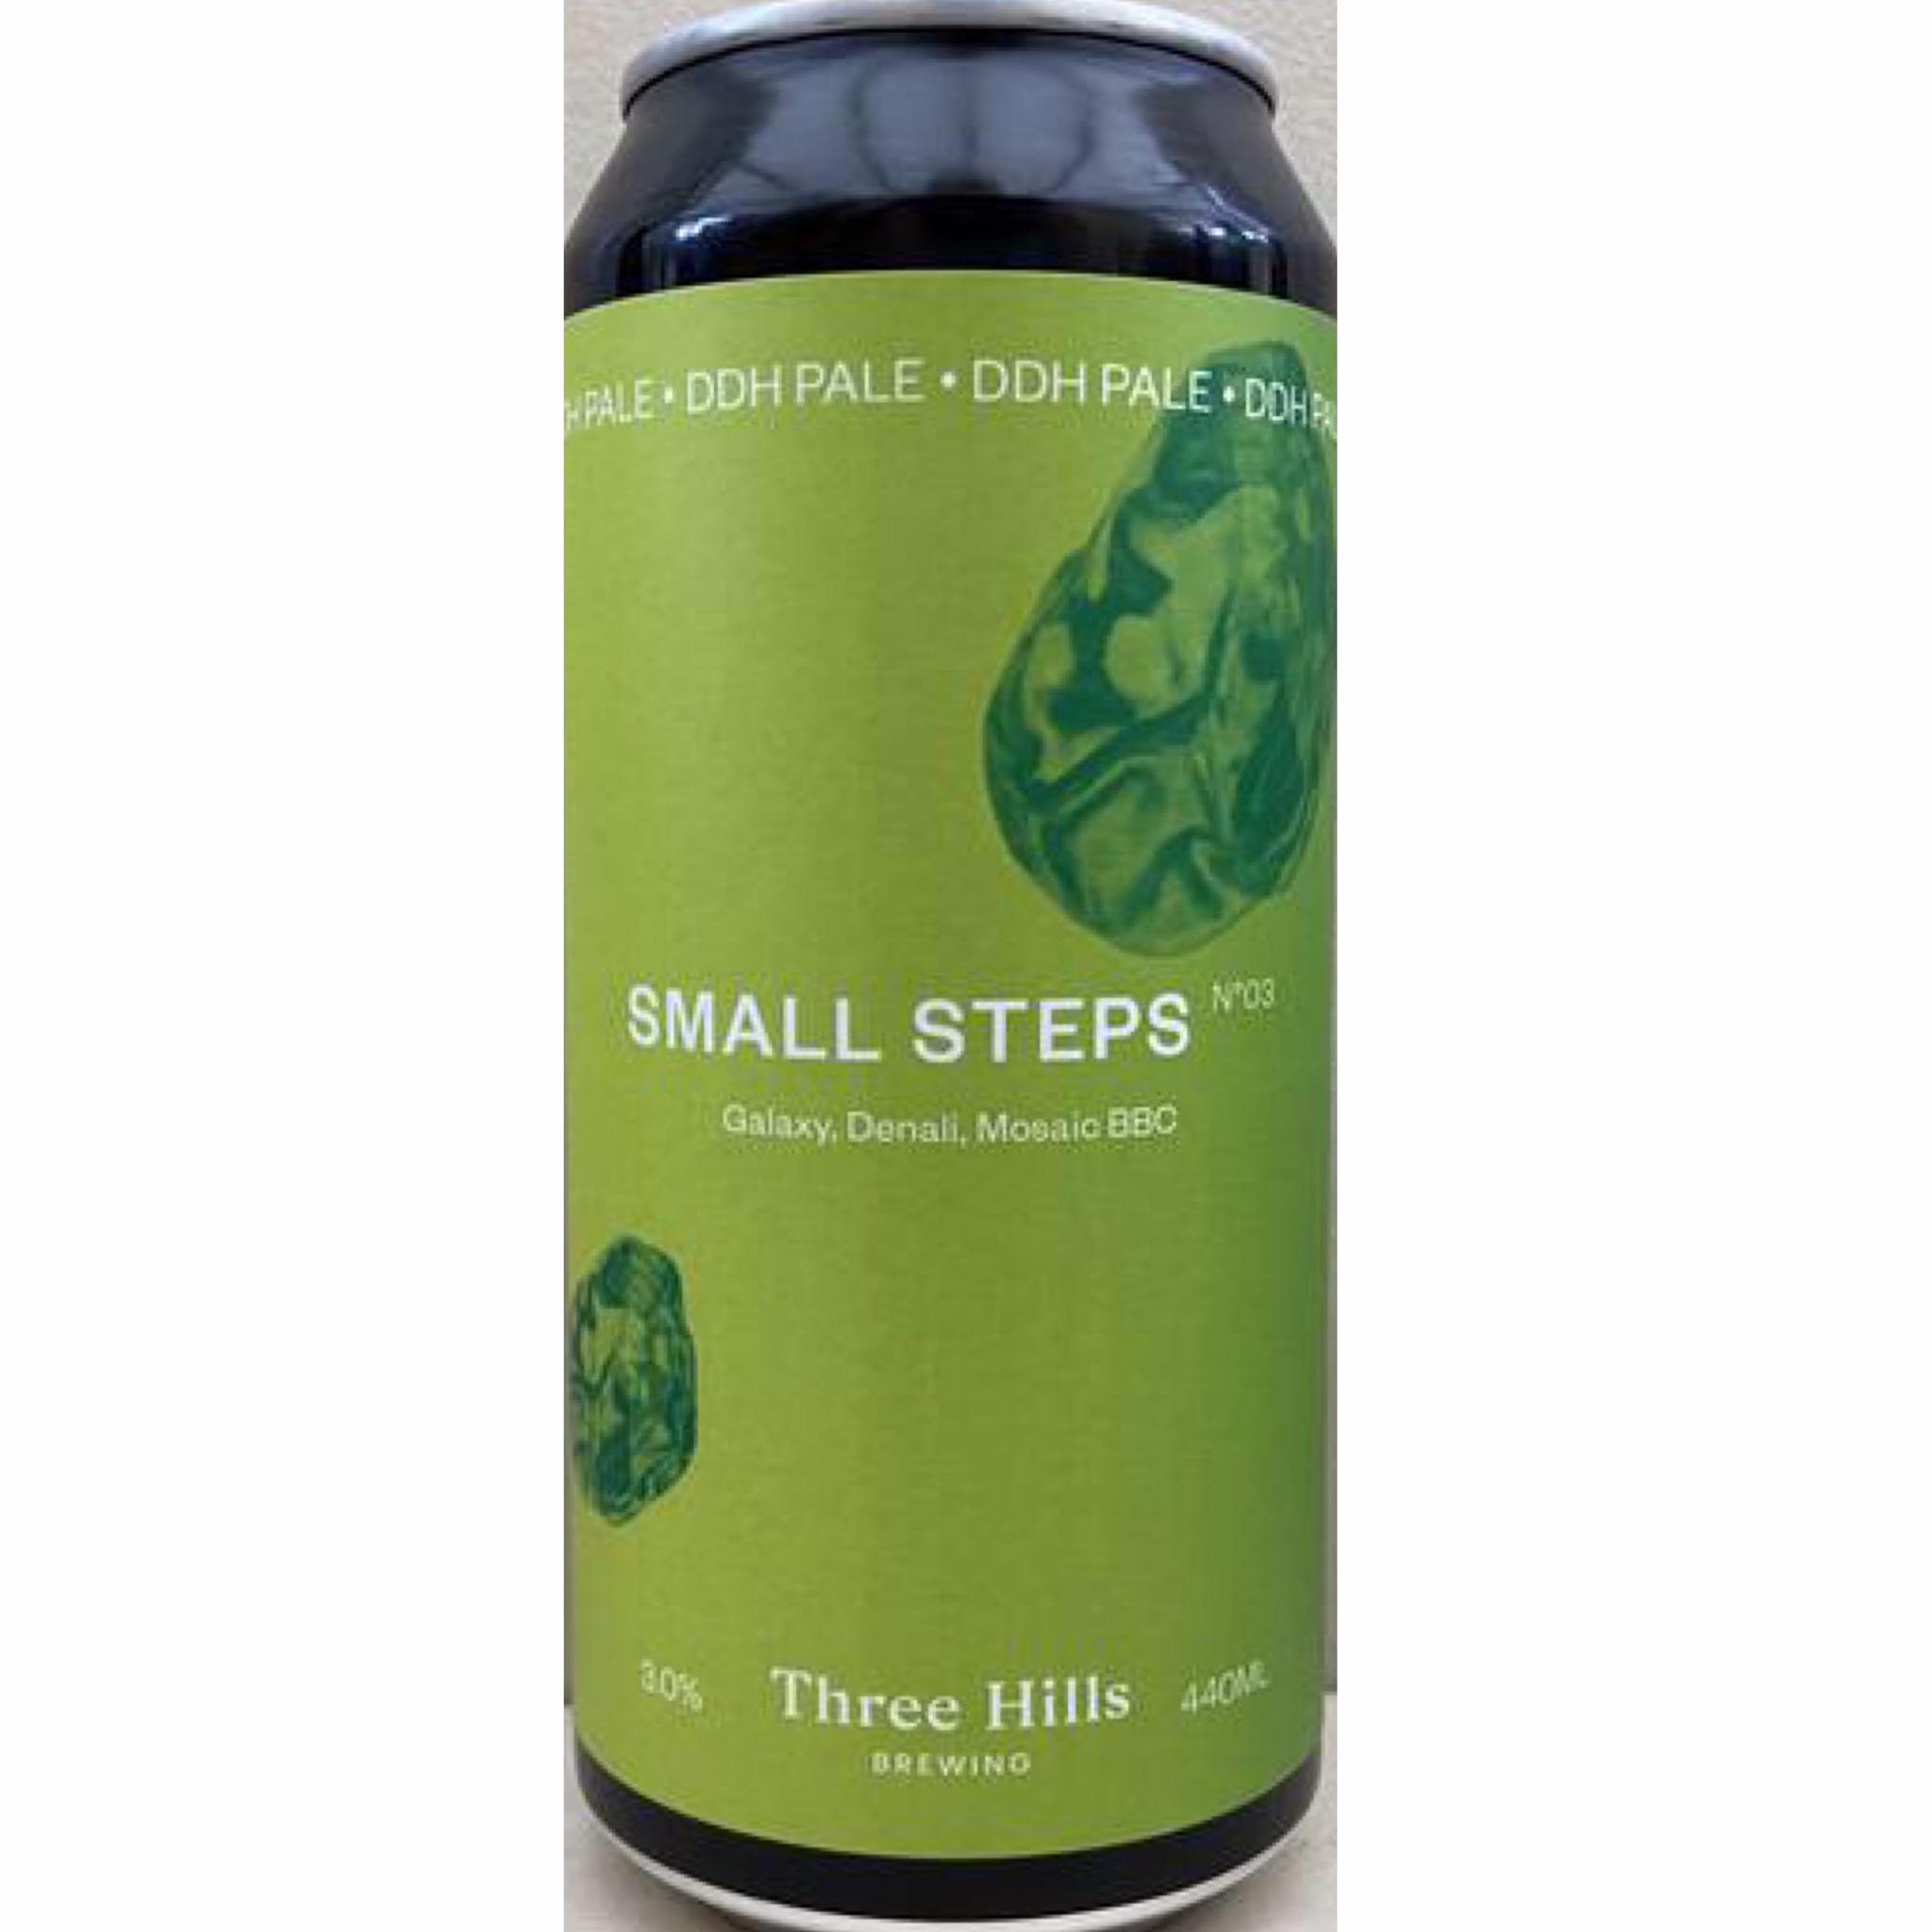 Small Steps No.3 DDH Pale 3% 440ml Three Hills Brewing